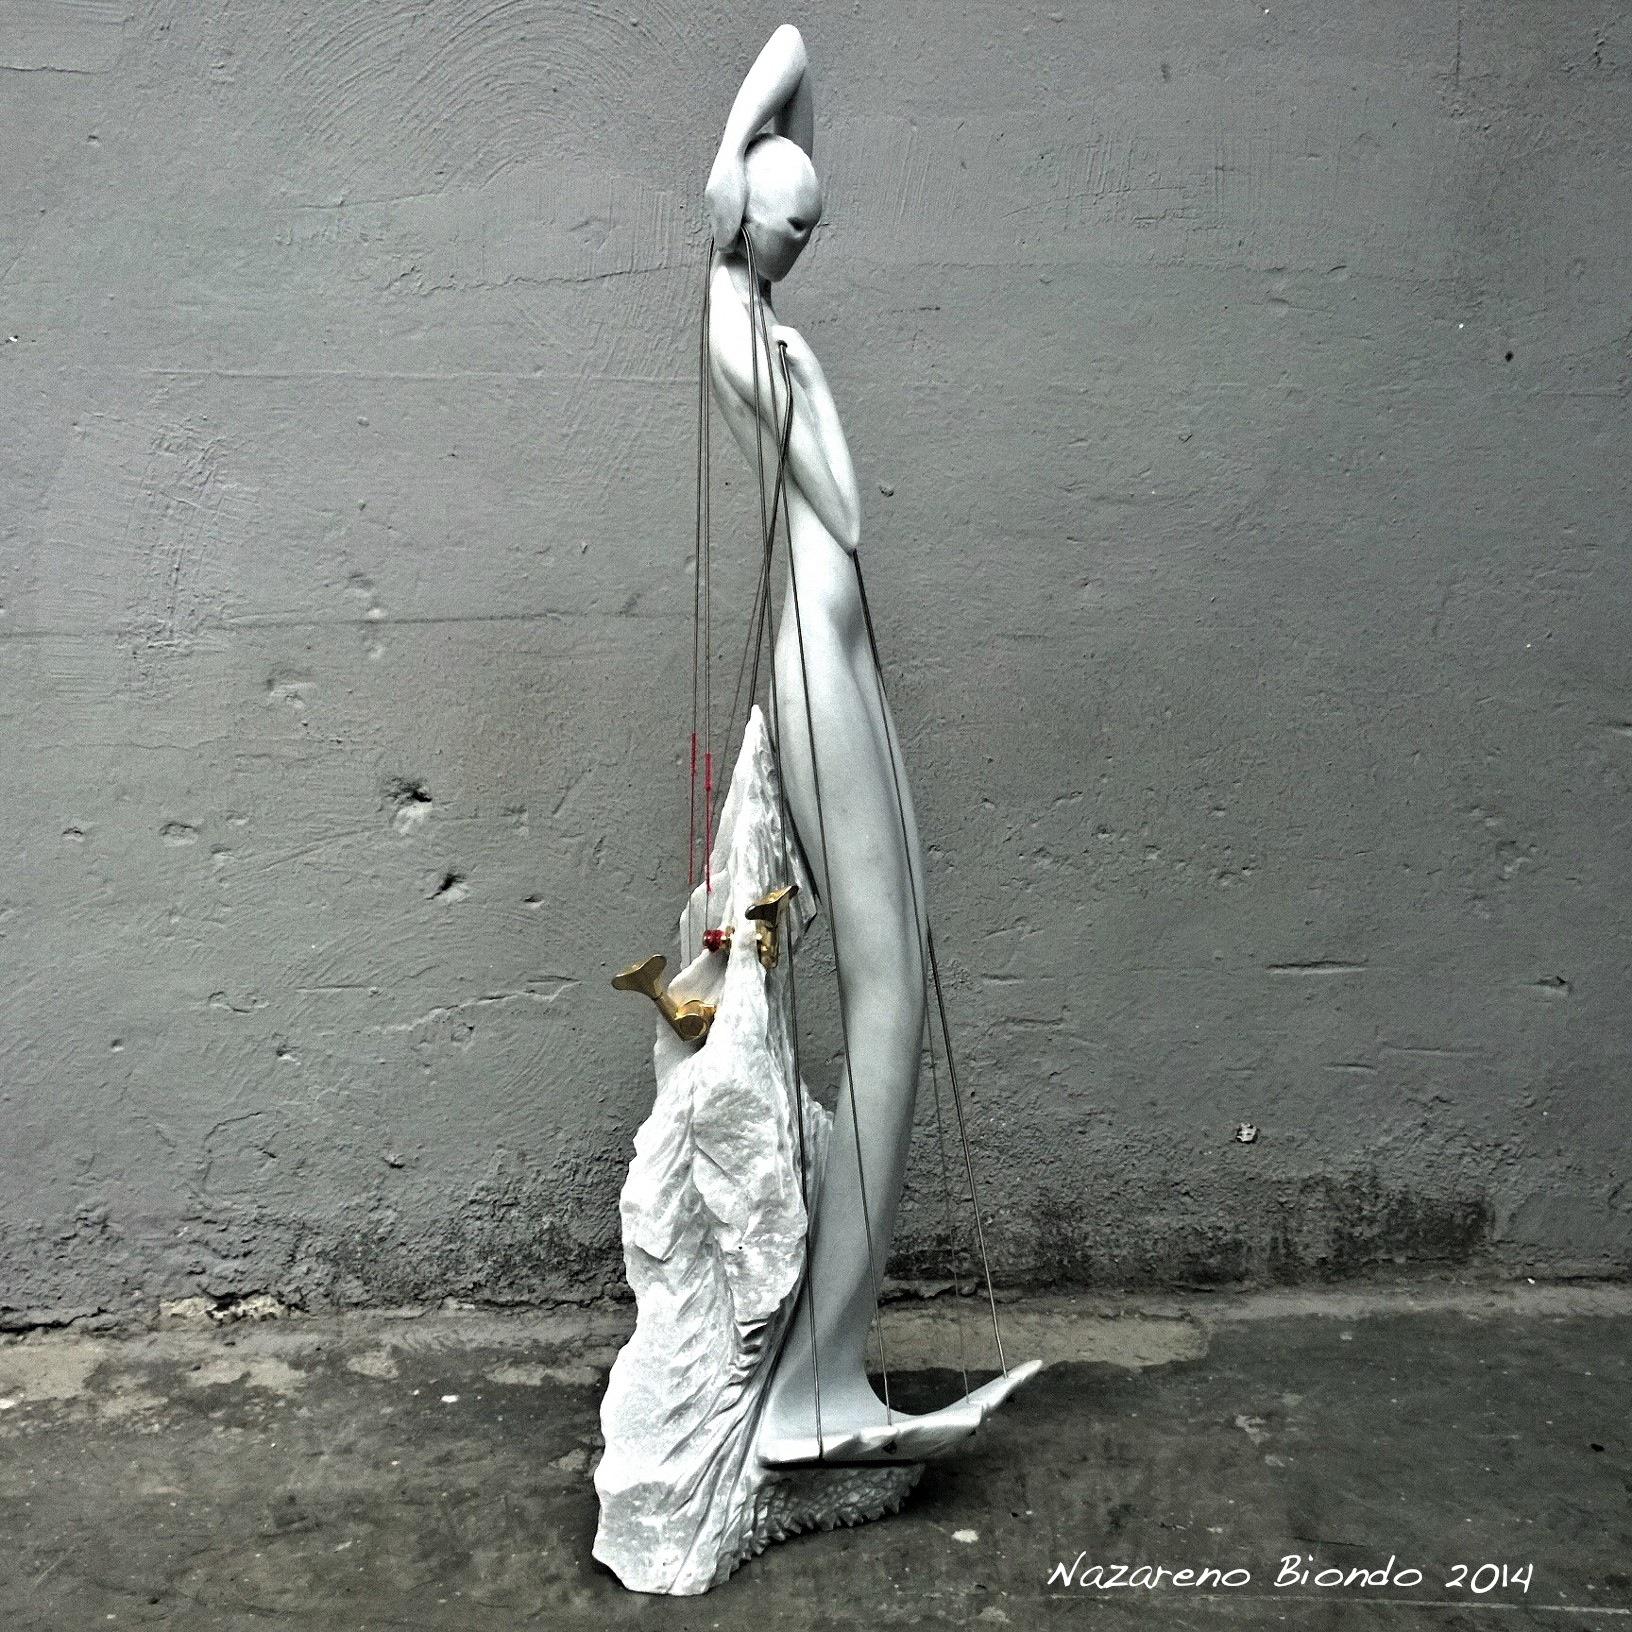 Nazareno Biondo Siren's Singing marmo di Carrara 85x30x30cm 2014